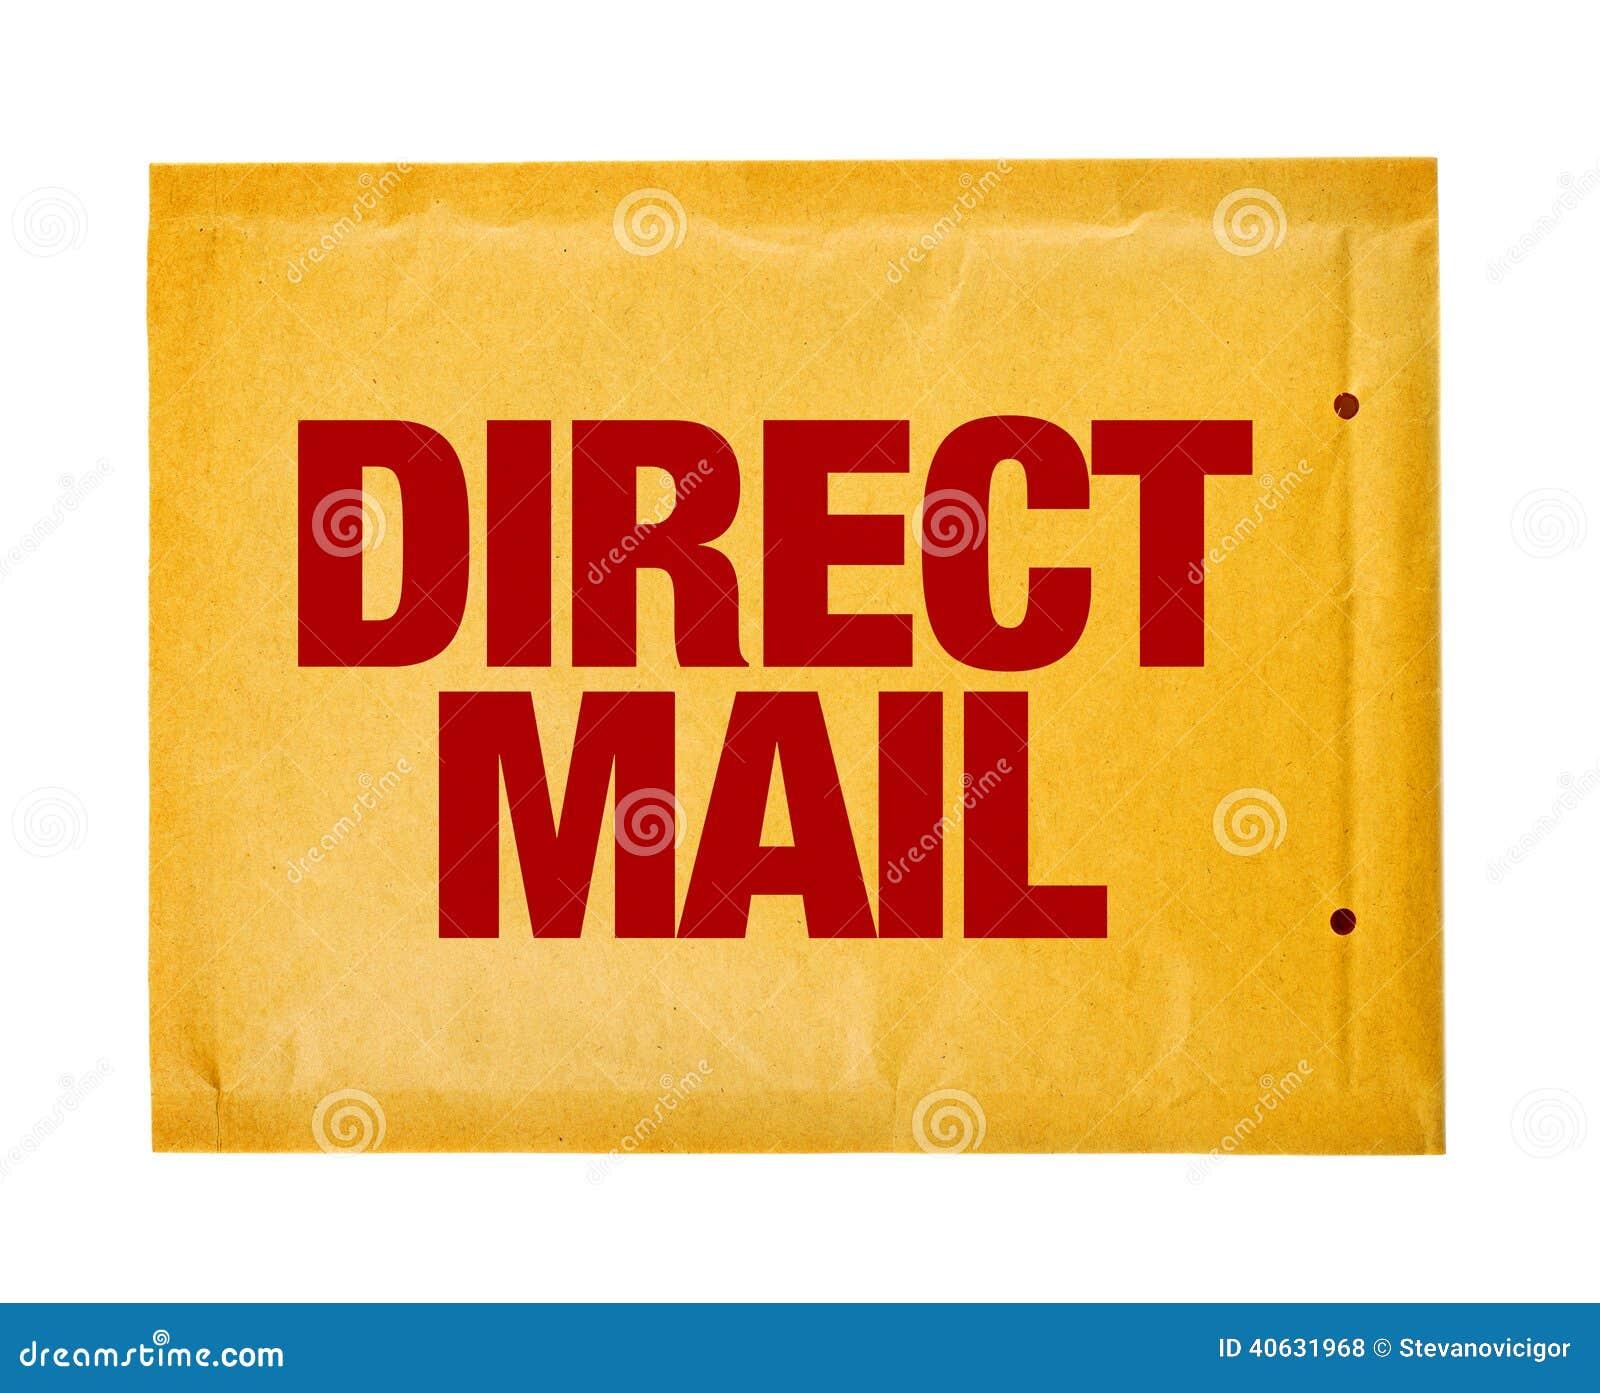 direct mail postal envelope on white background royalty free stock image. Black Bedroom Furniture Sets. Home Design Ideas